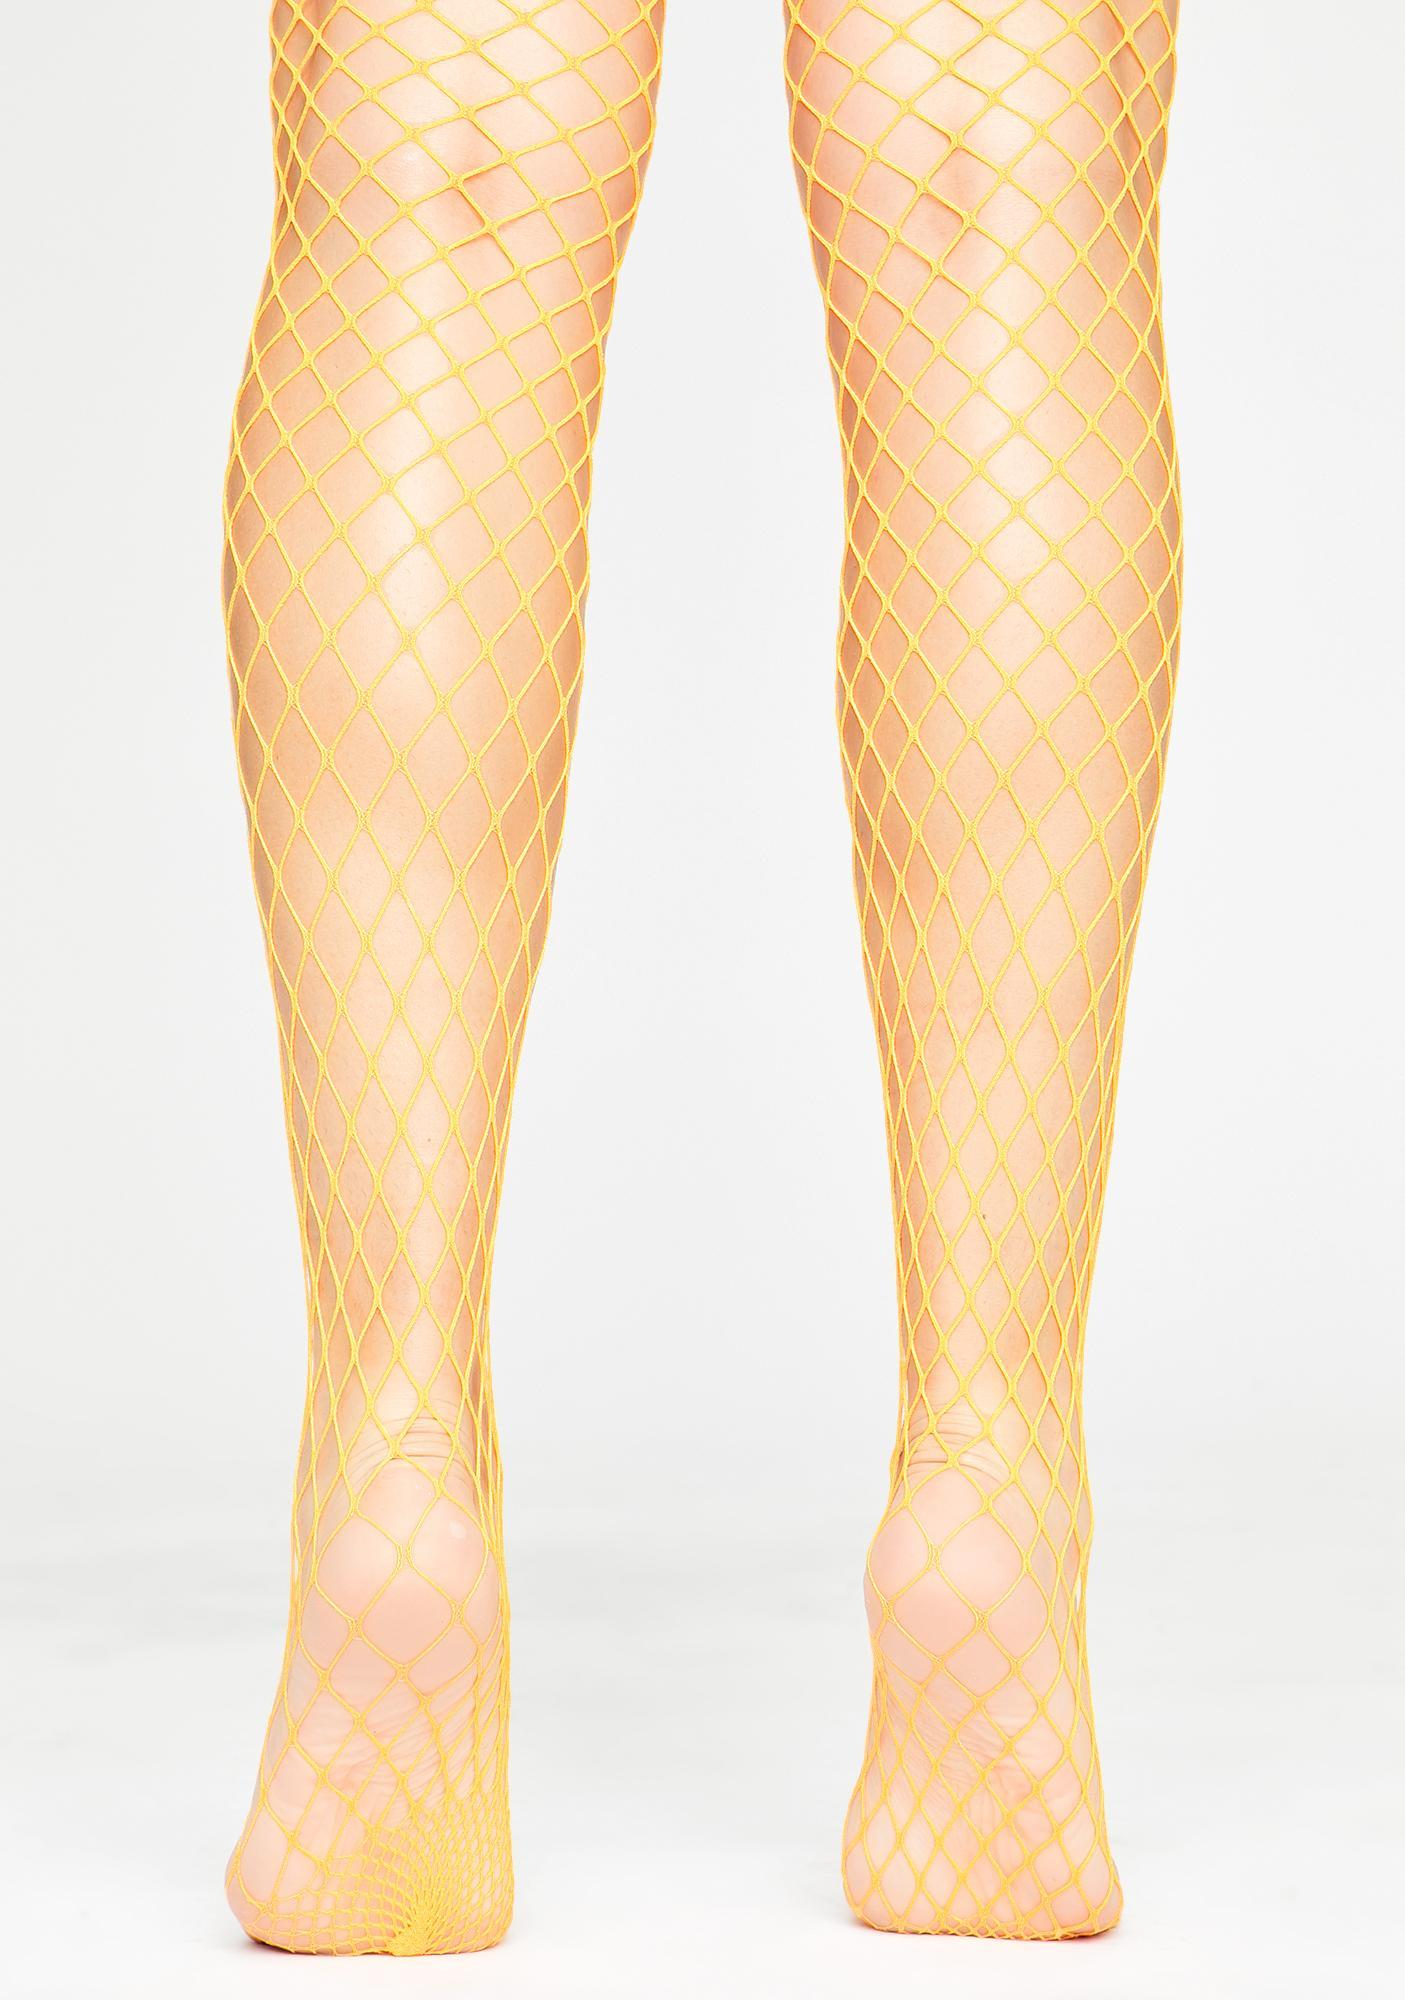 Slay Queen Fishnet Tights